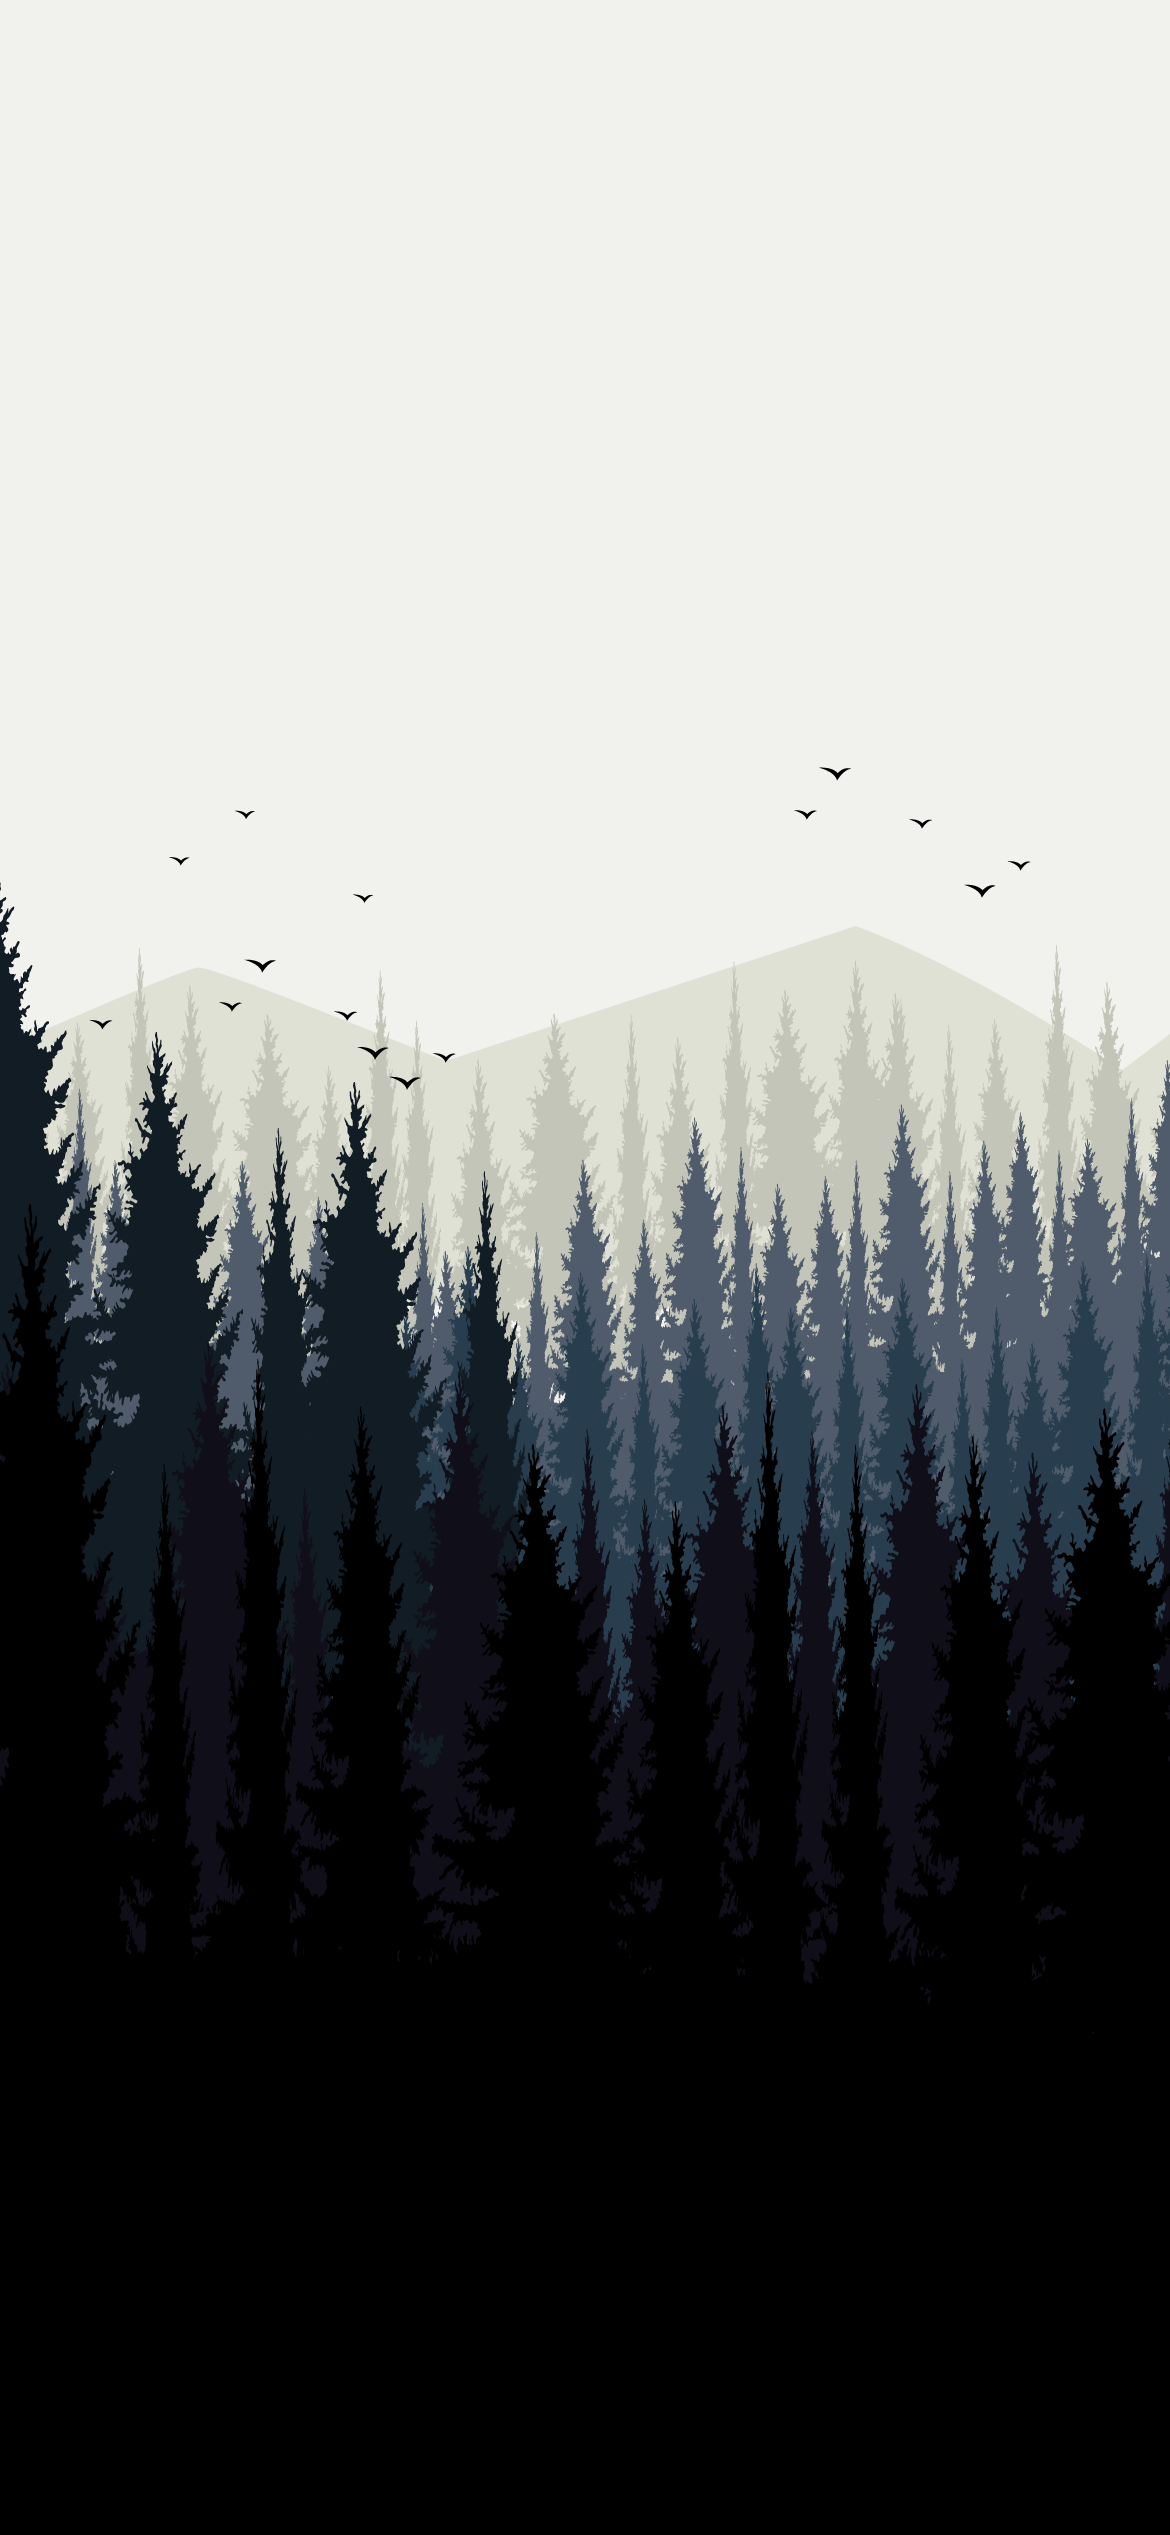 forest landscape minimalistic